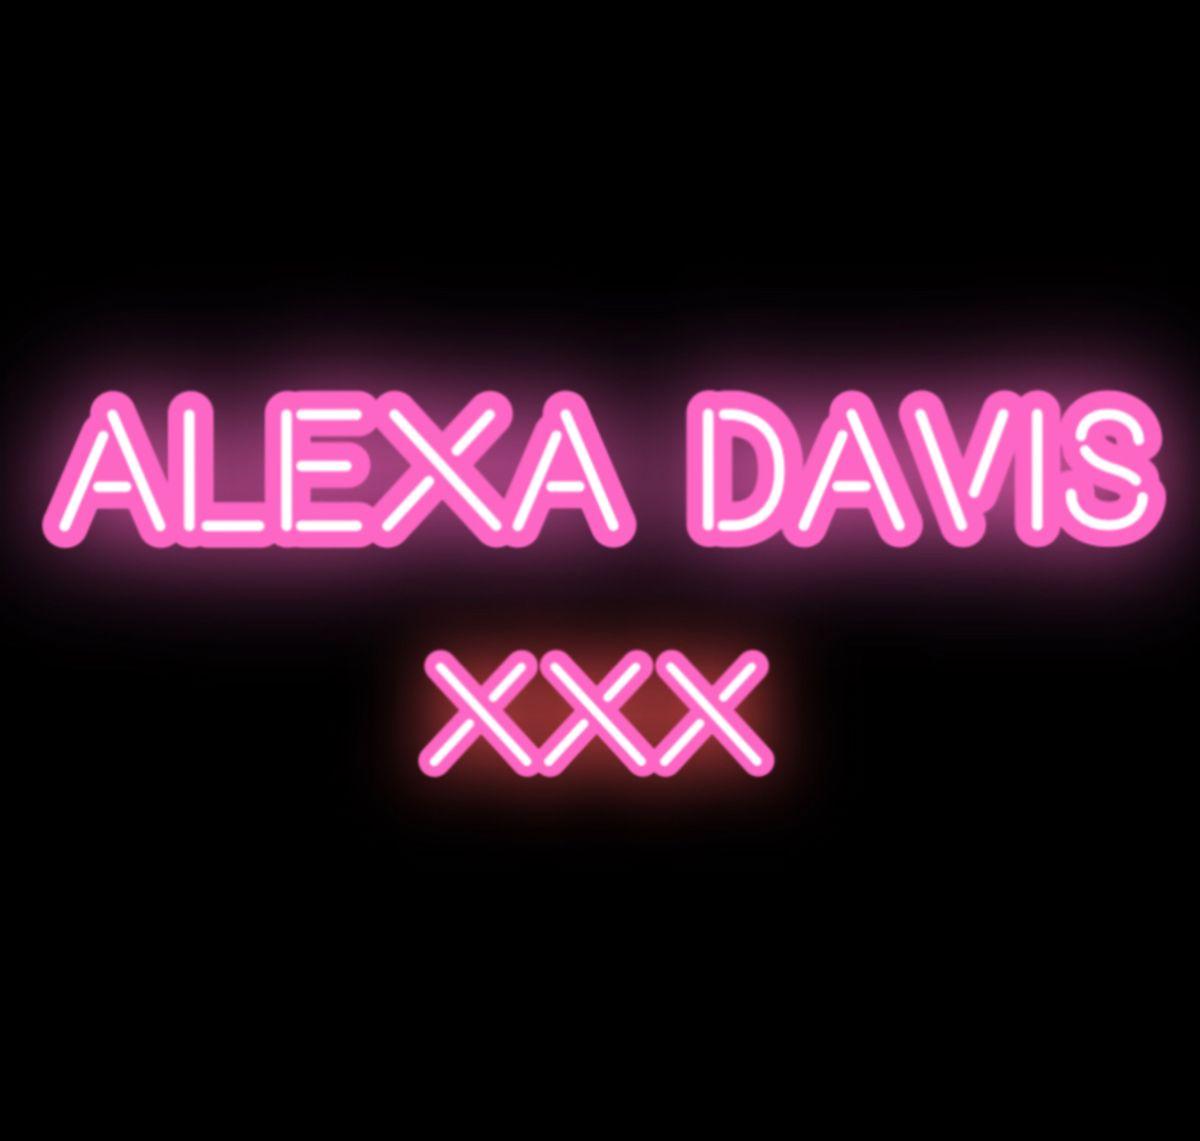 @therealalexadavis